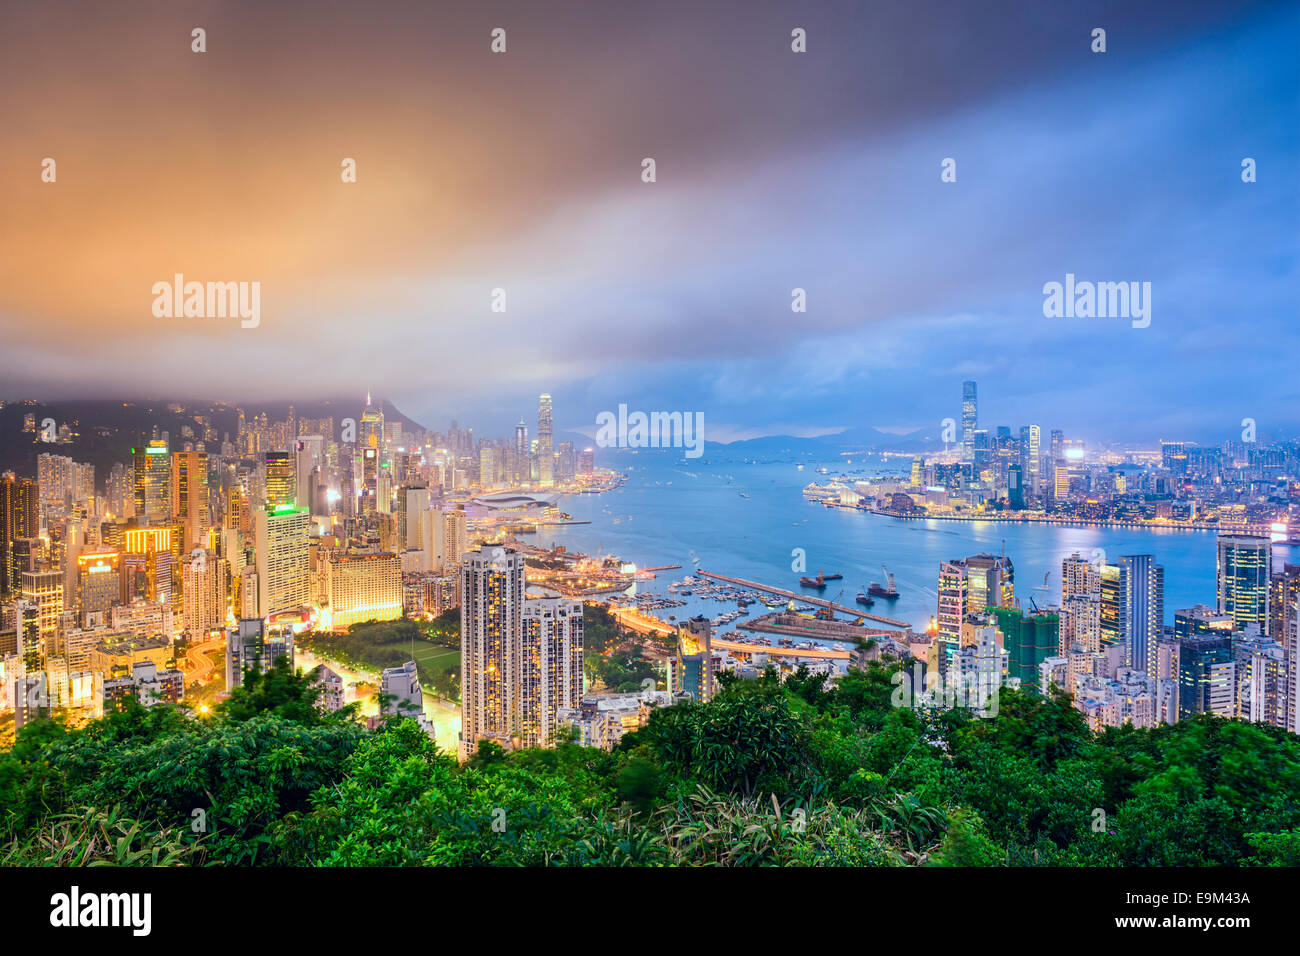 Hong Kong, China city skyline from Braemer Hill. - Stock Image